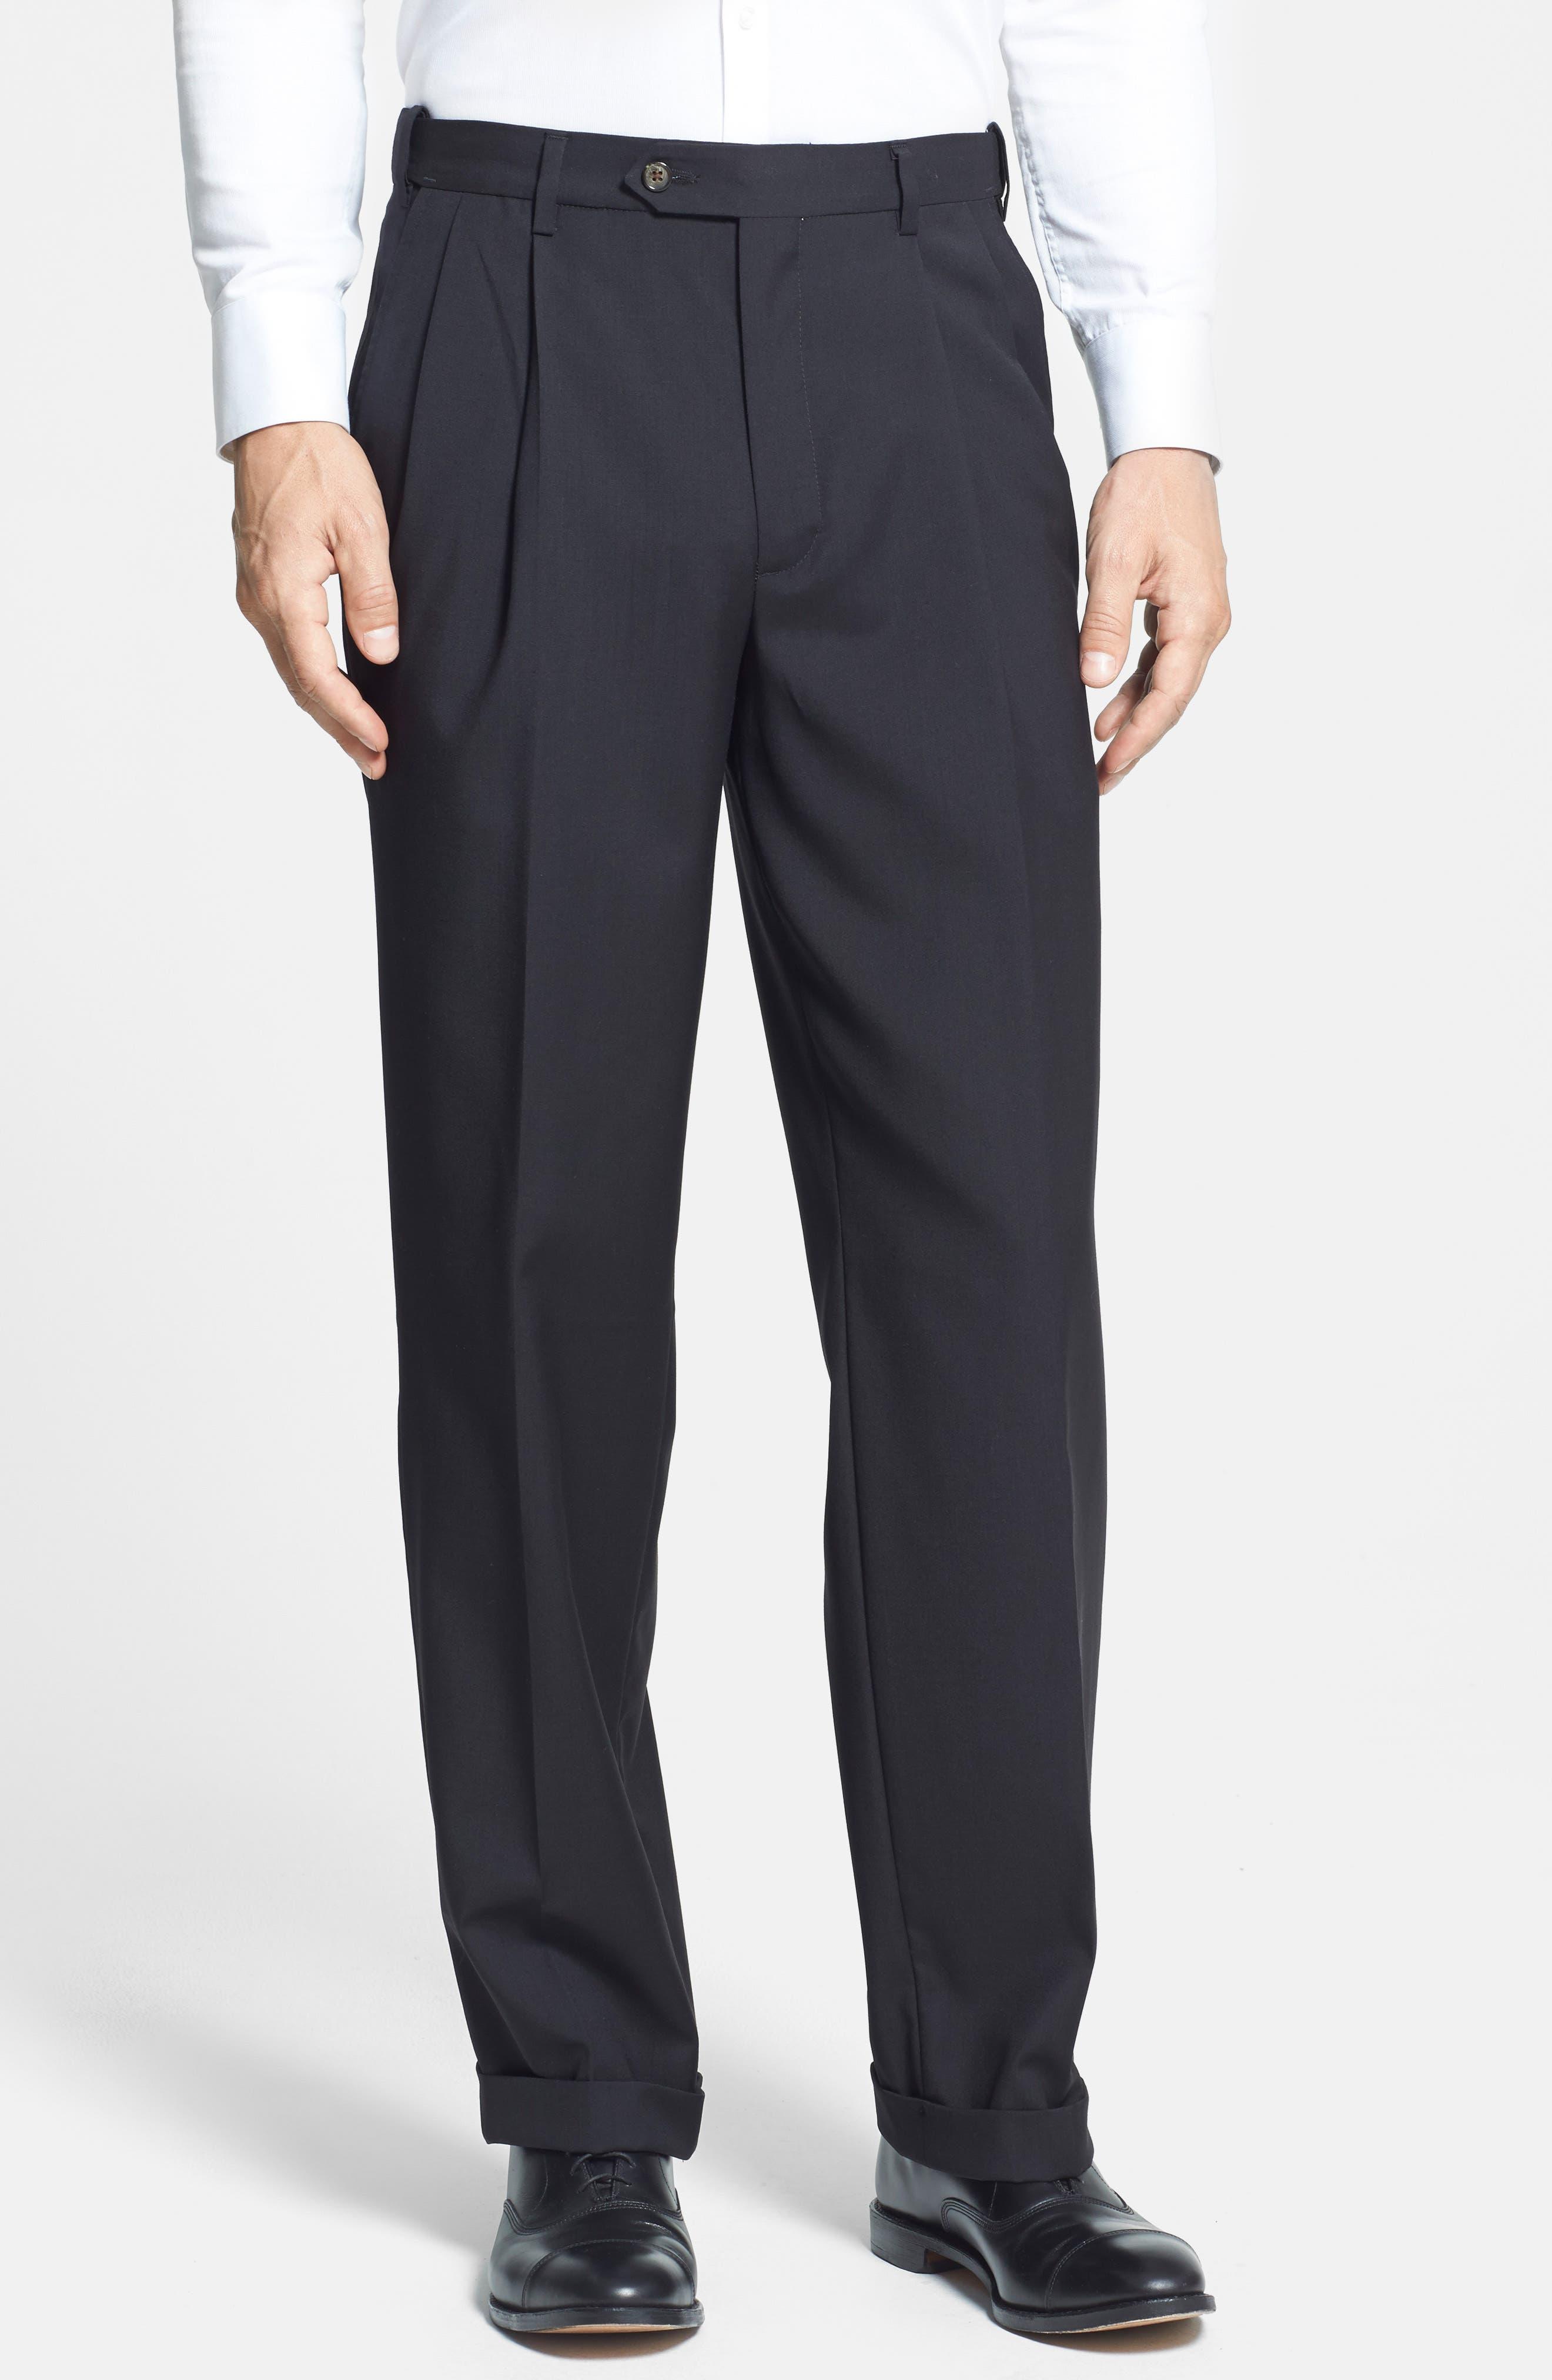 BERLE, Self Sizer Waist Pleated Trousers, Alternate thumbnail 5, color, BLACK